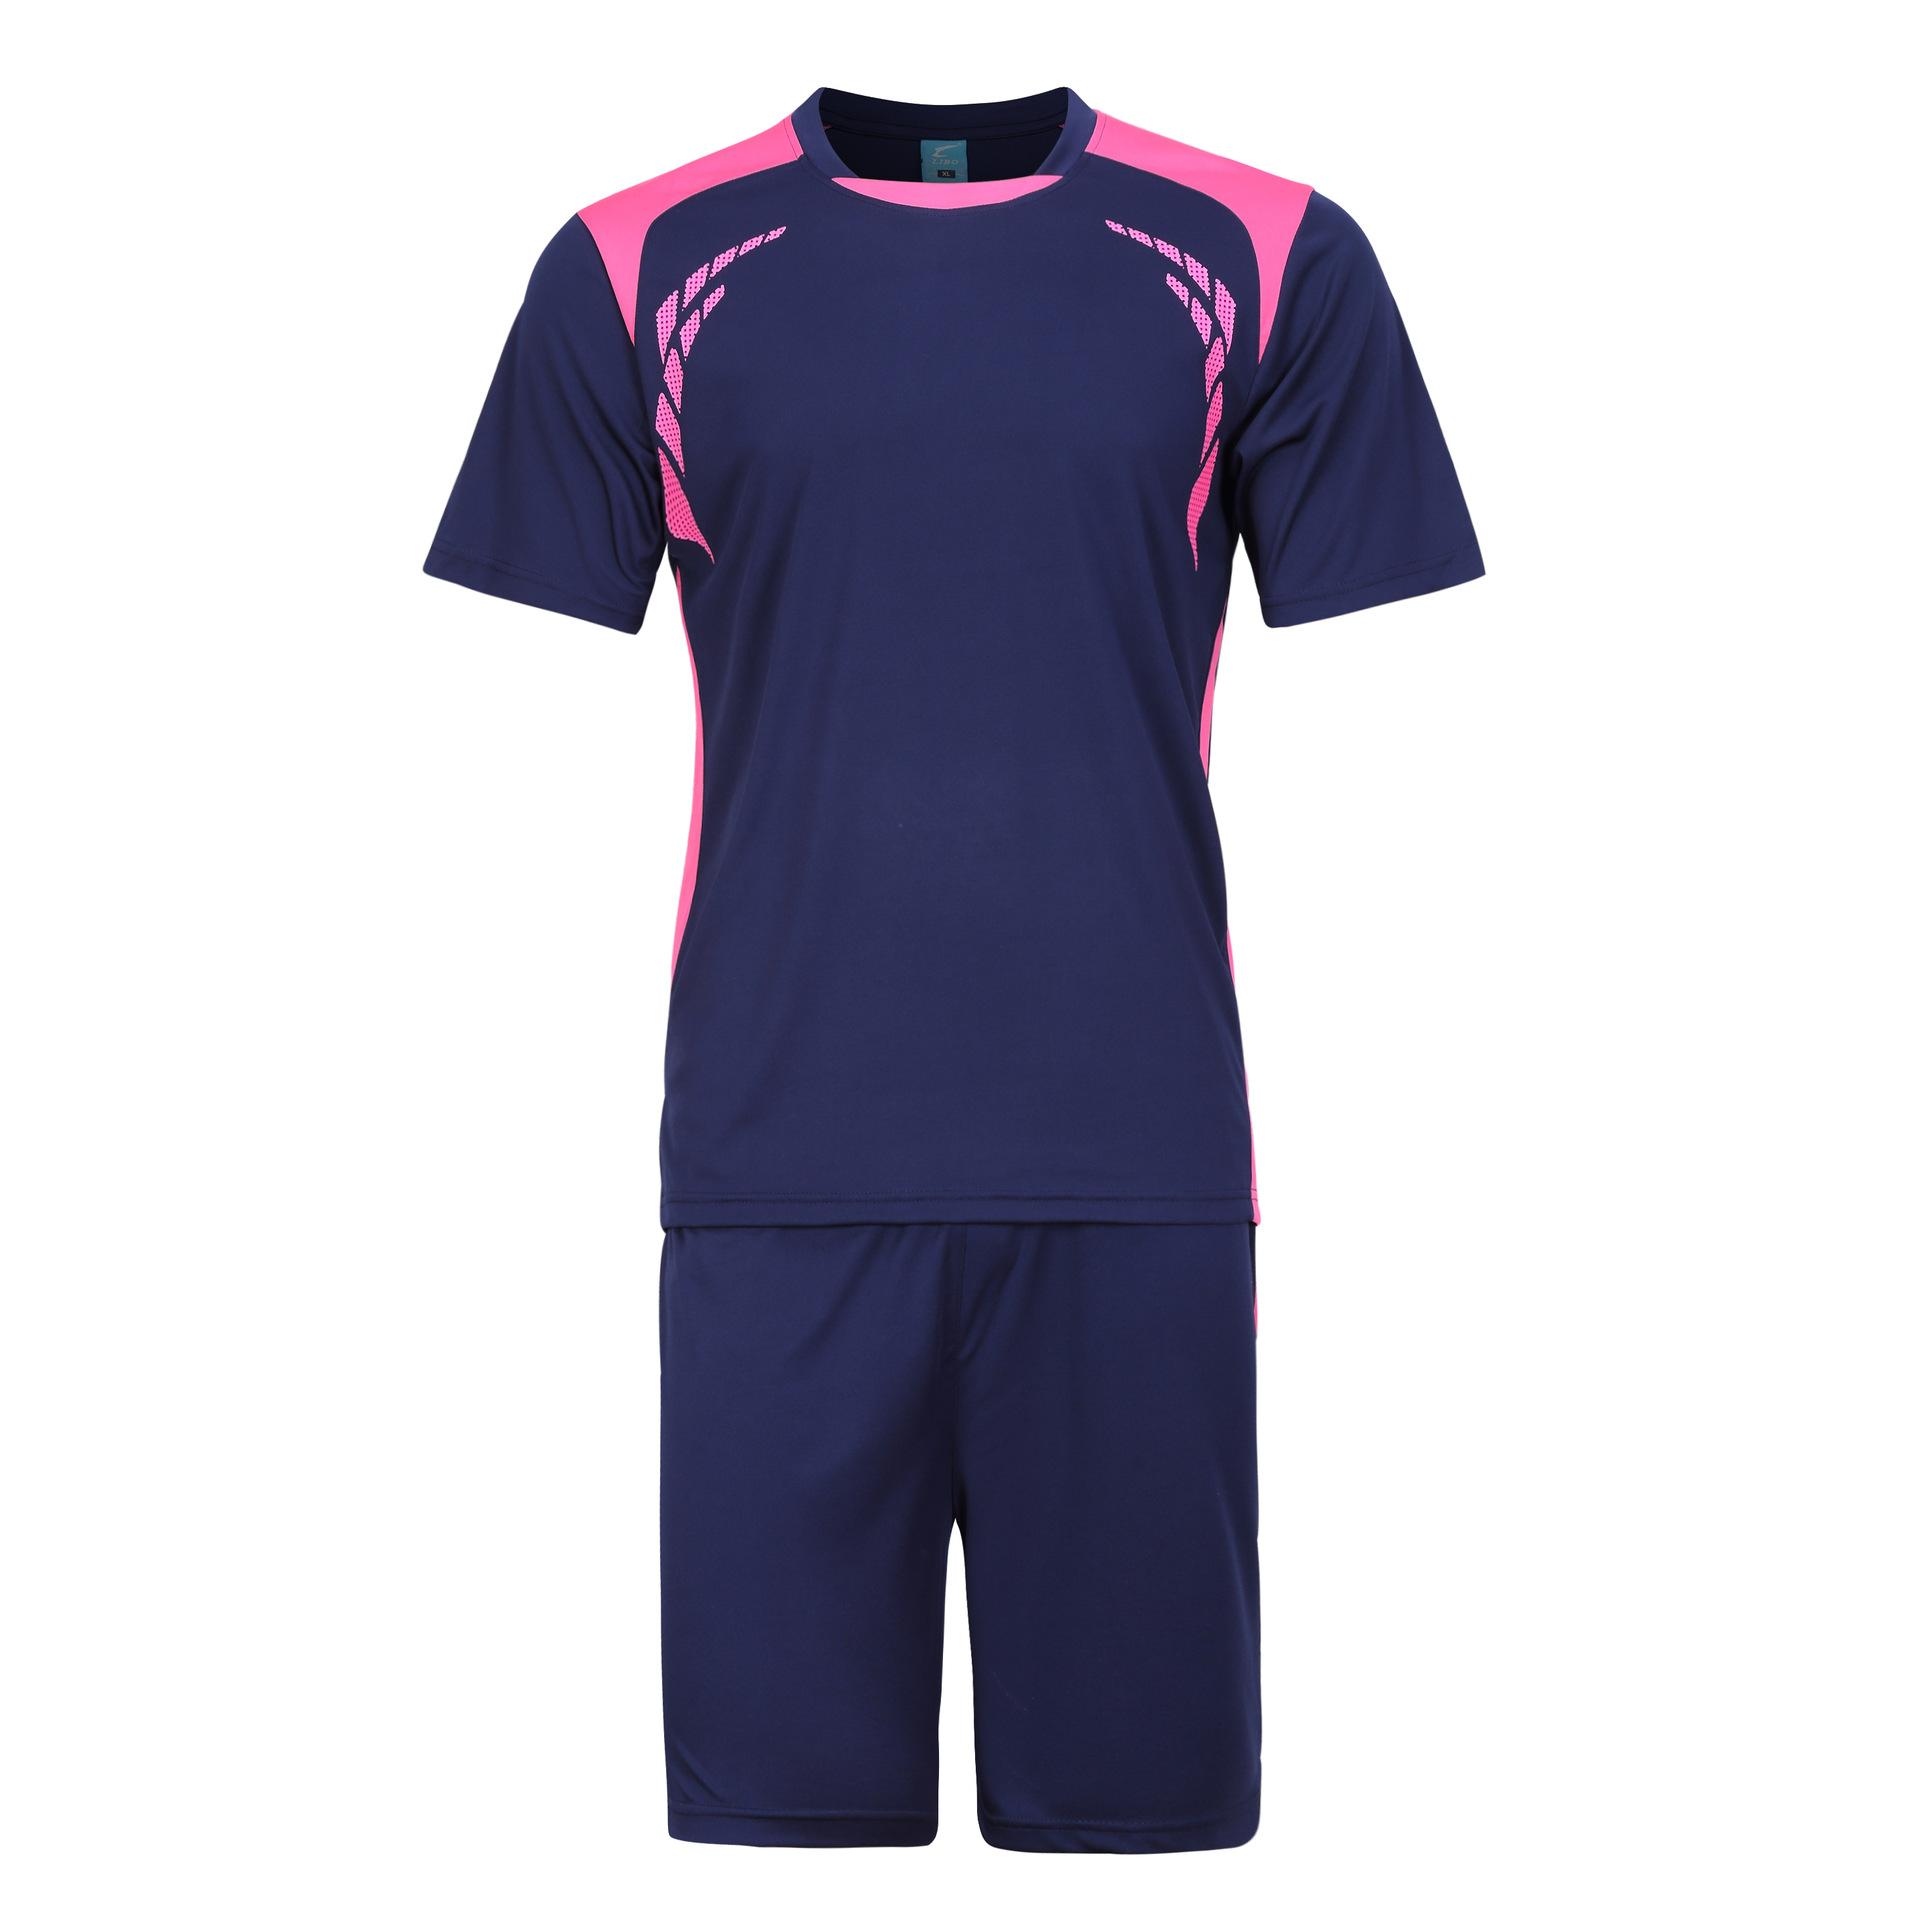 LIBO 2016 New Soccer Jersey Set Kids Football Kits Youth Men Futbol Training Suit Blank Breathable Short Sleeve Tracksuits(China (Mainland))